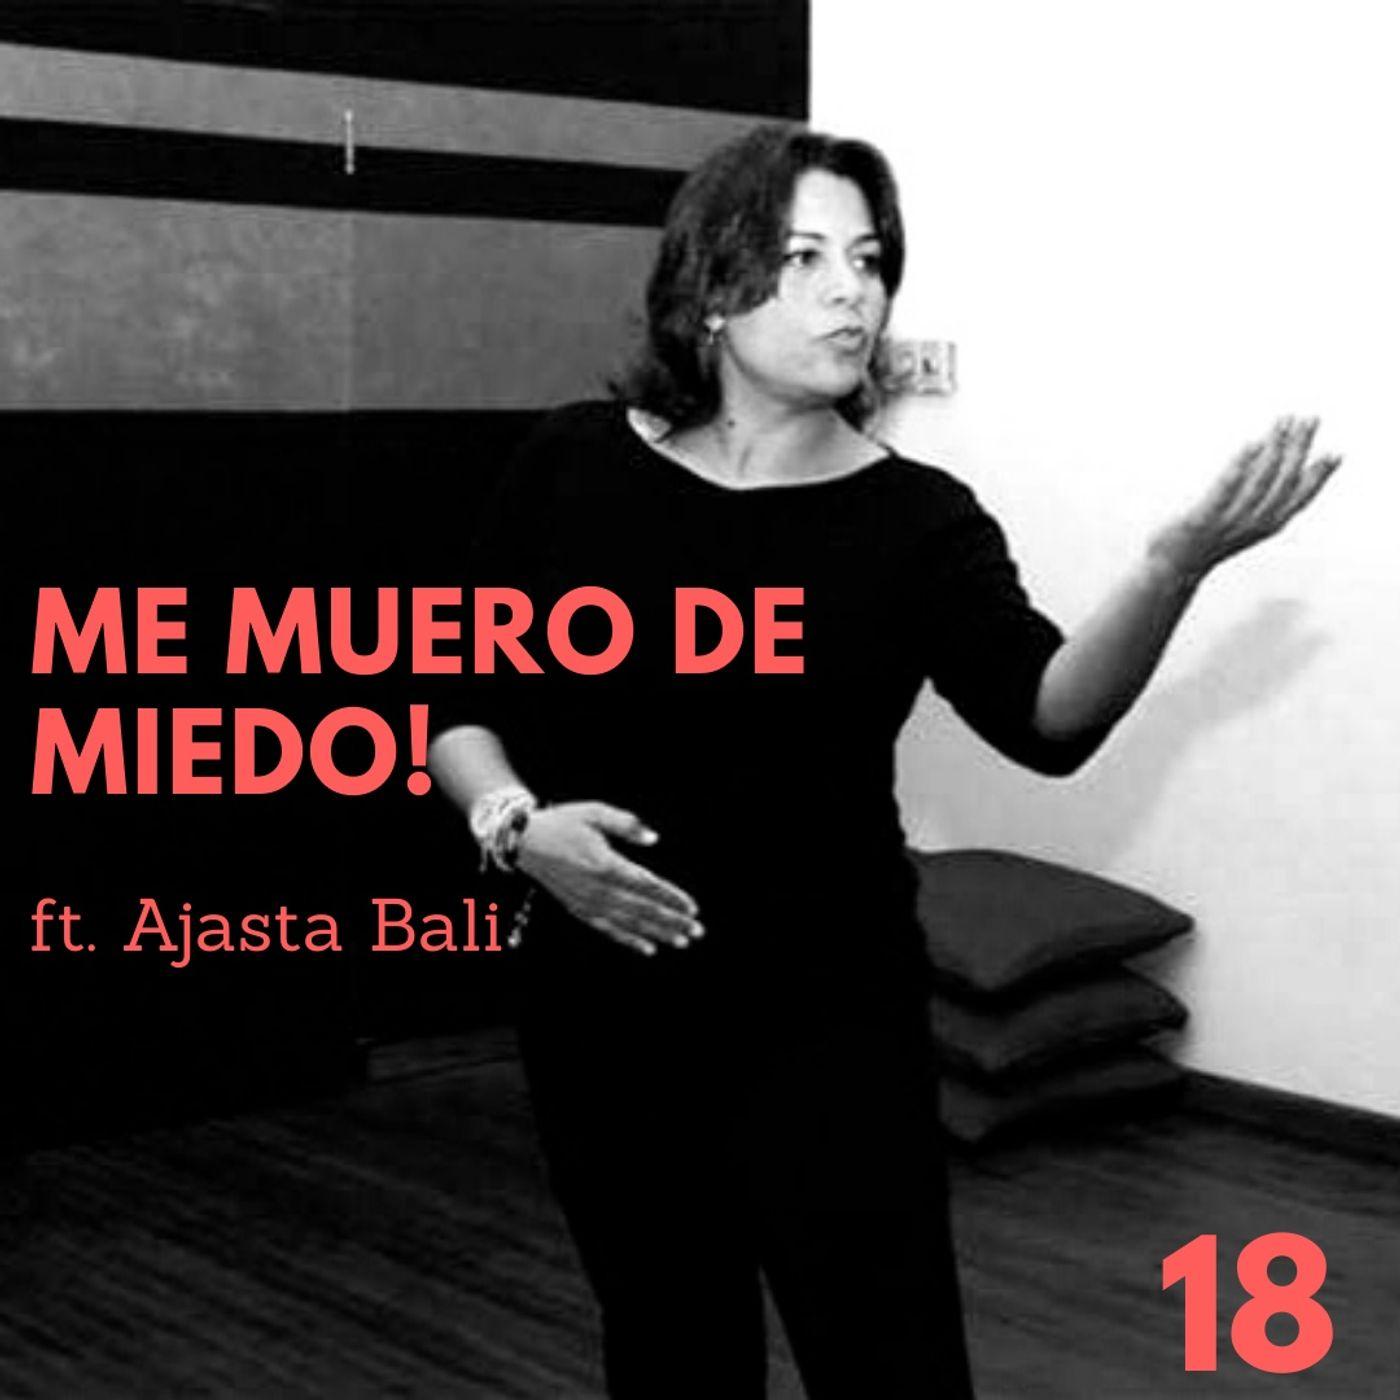 ME MUERO DE MIEDO! ft Ajasta Bali